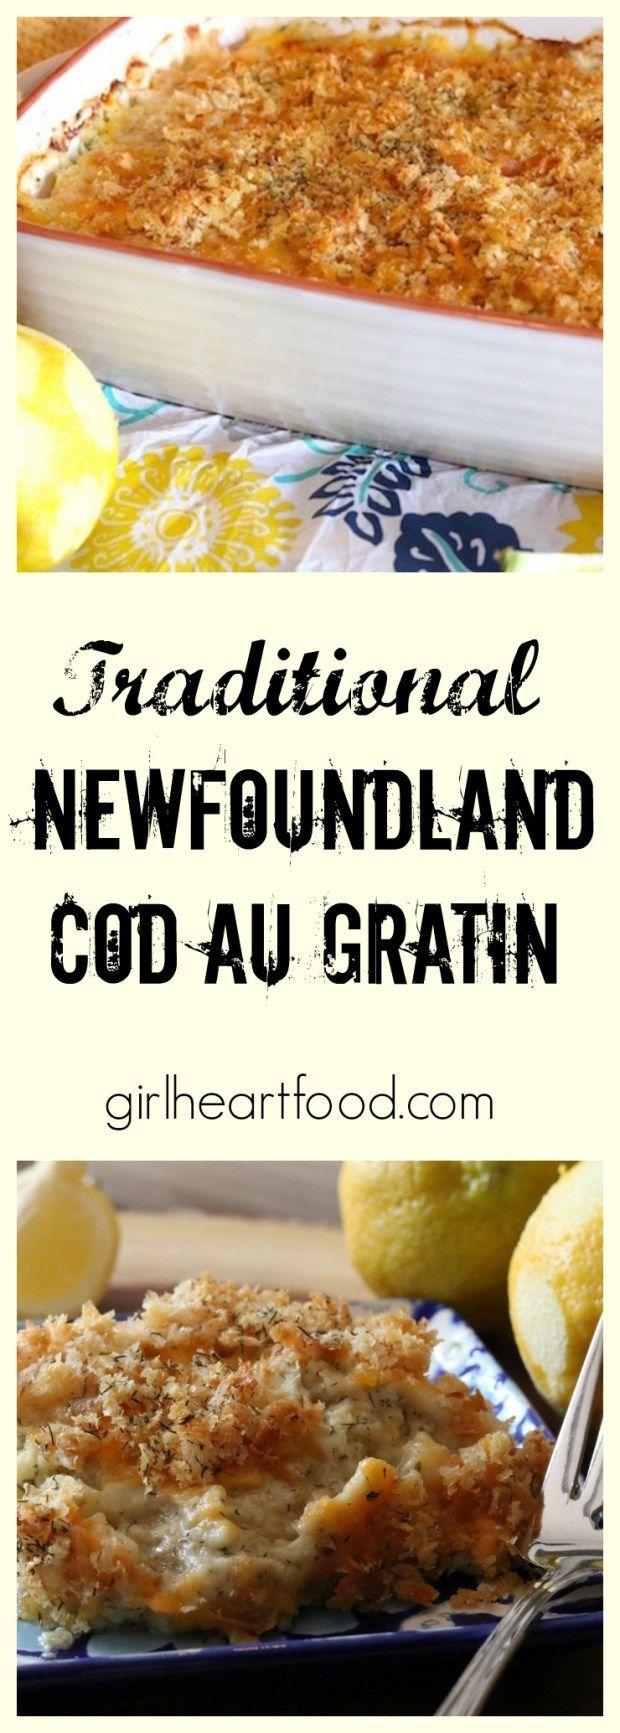 Traditional Newfoundland Cod au Gratin - girlheartfood.com